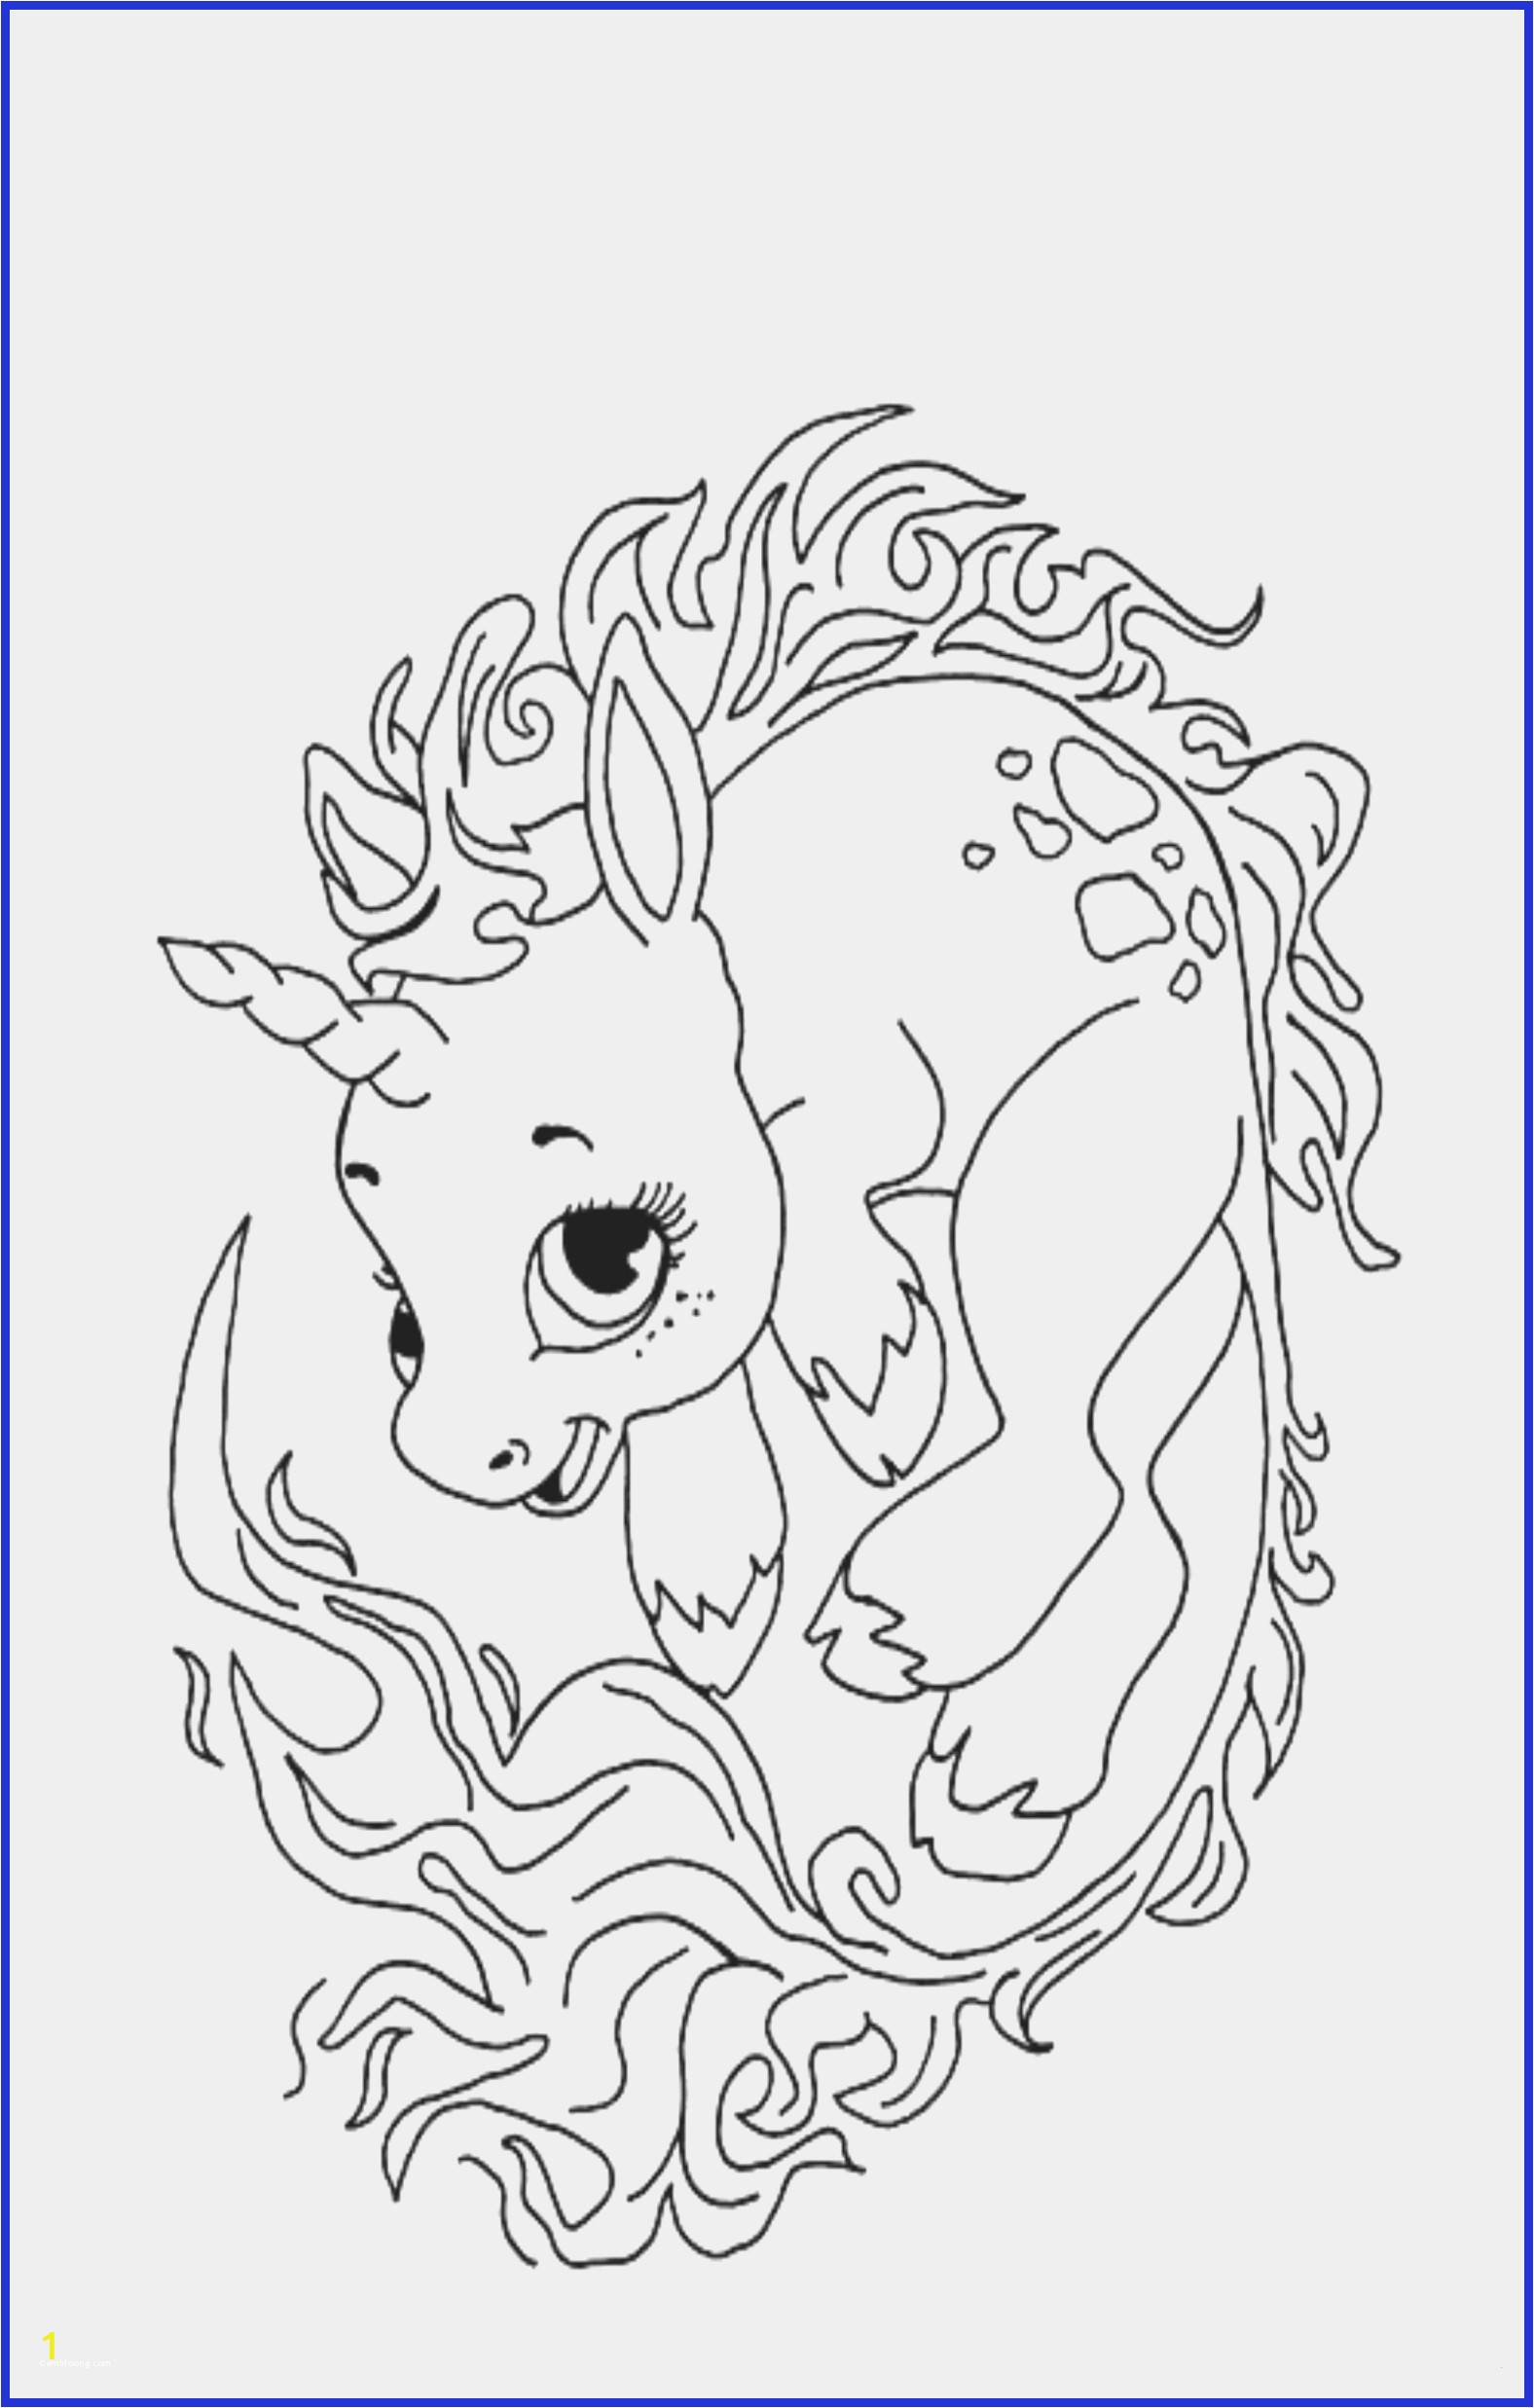 disney coloring pages for adults online unique 25 luxury graphy coloring page animals for adults of disney coloring pages for adults online